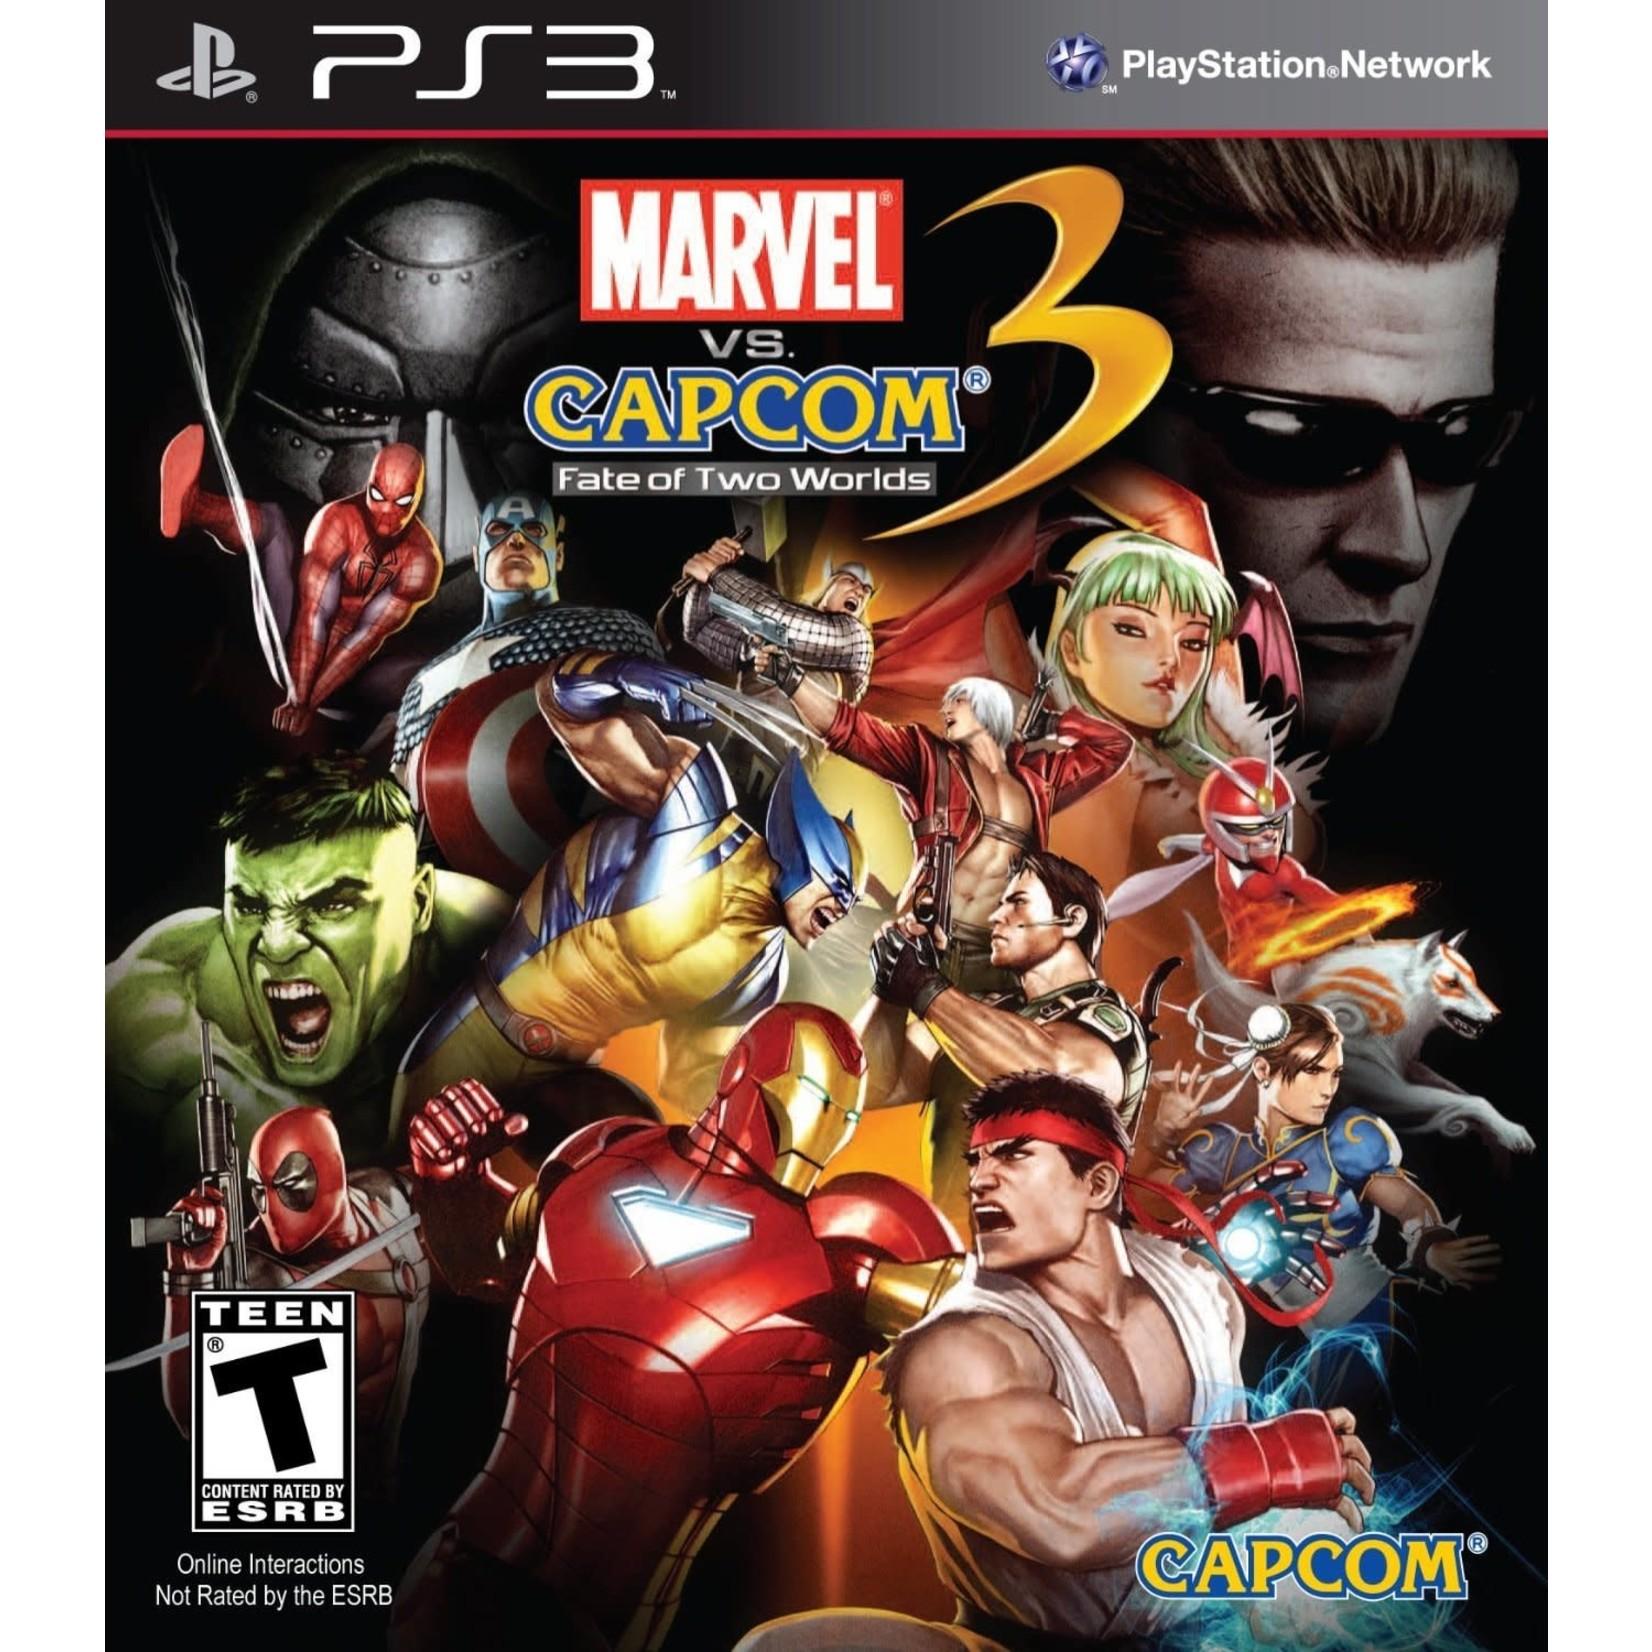 PS3U-Marvel vs. Capcom 3: Fate of Two Worlds